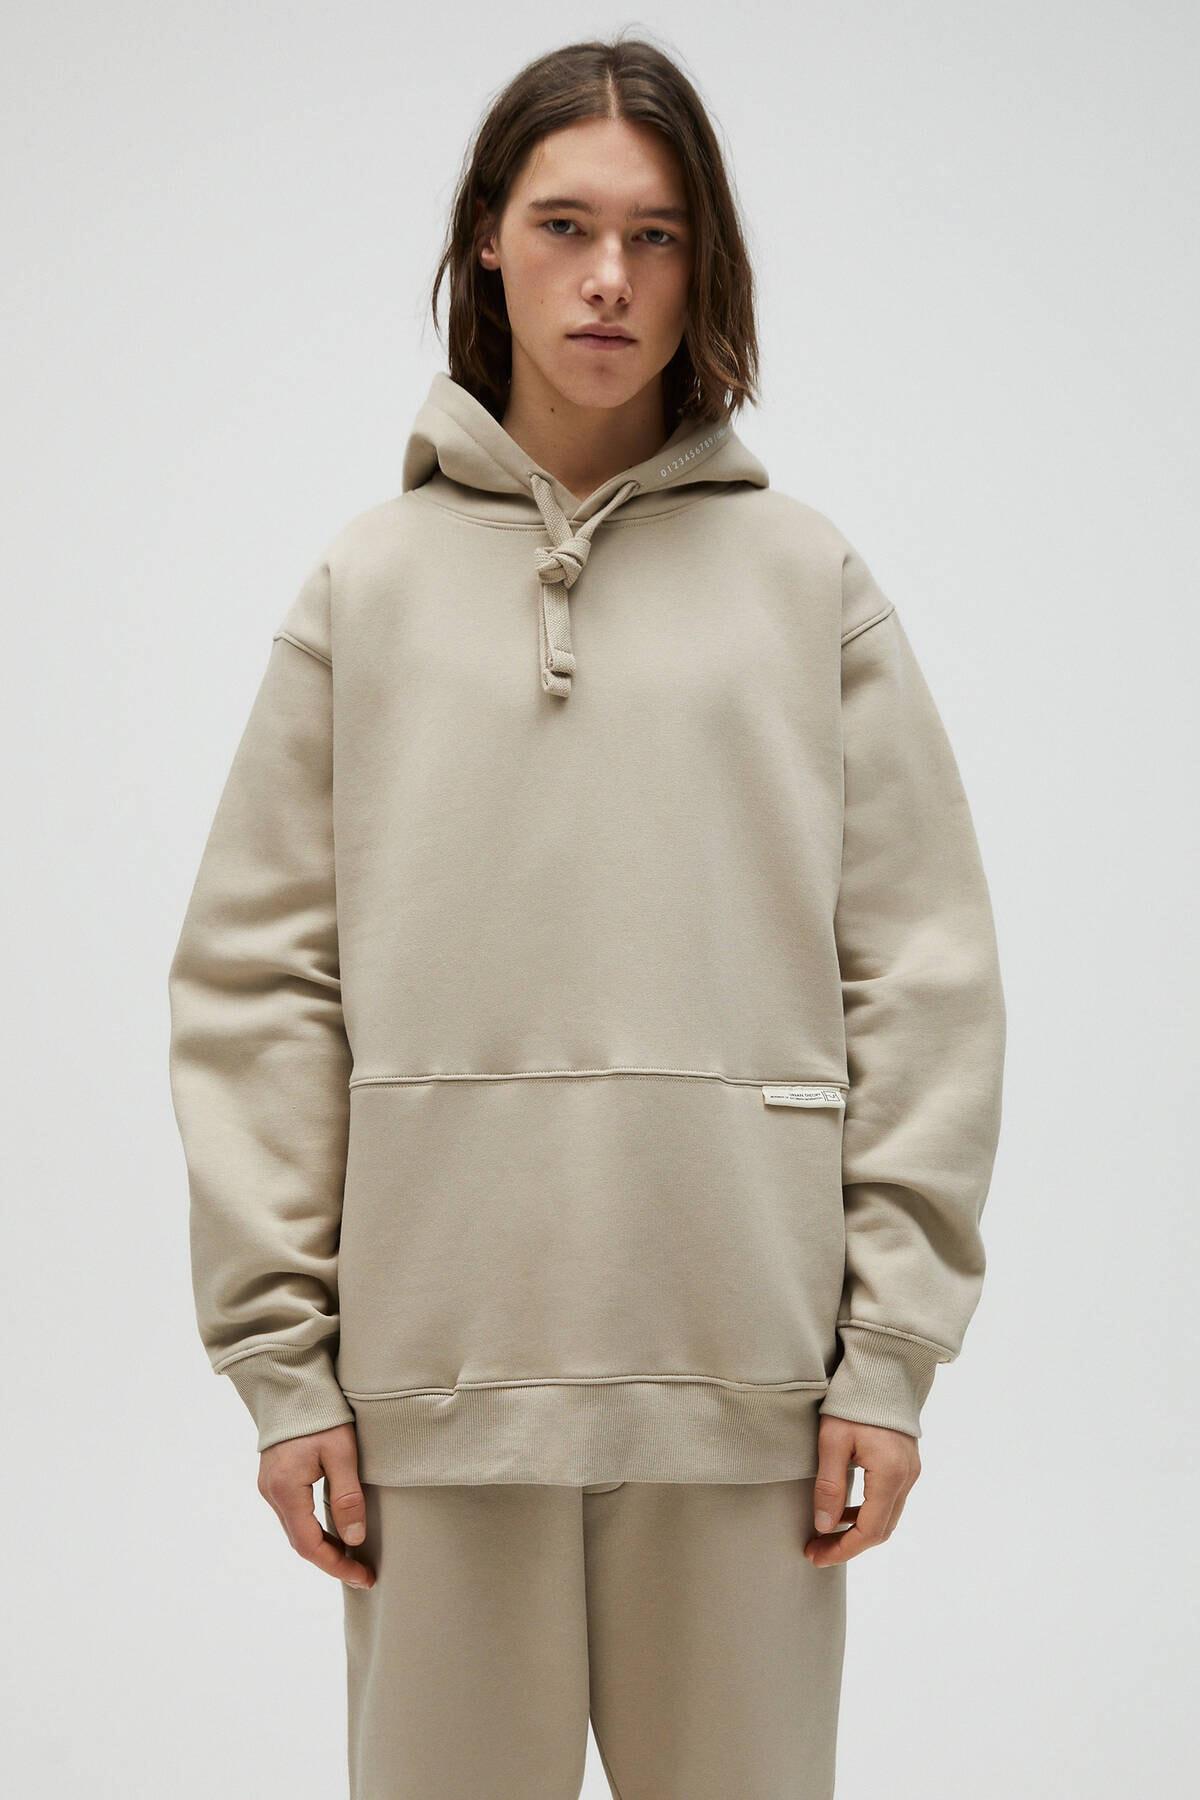 Pull & Bear Erkek Kum Rengi Kapüşonlu Oversize Sweatshirt 04591560 0